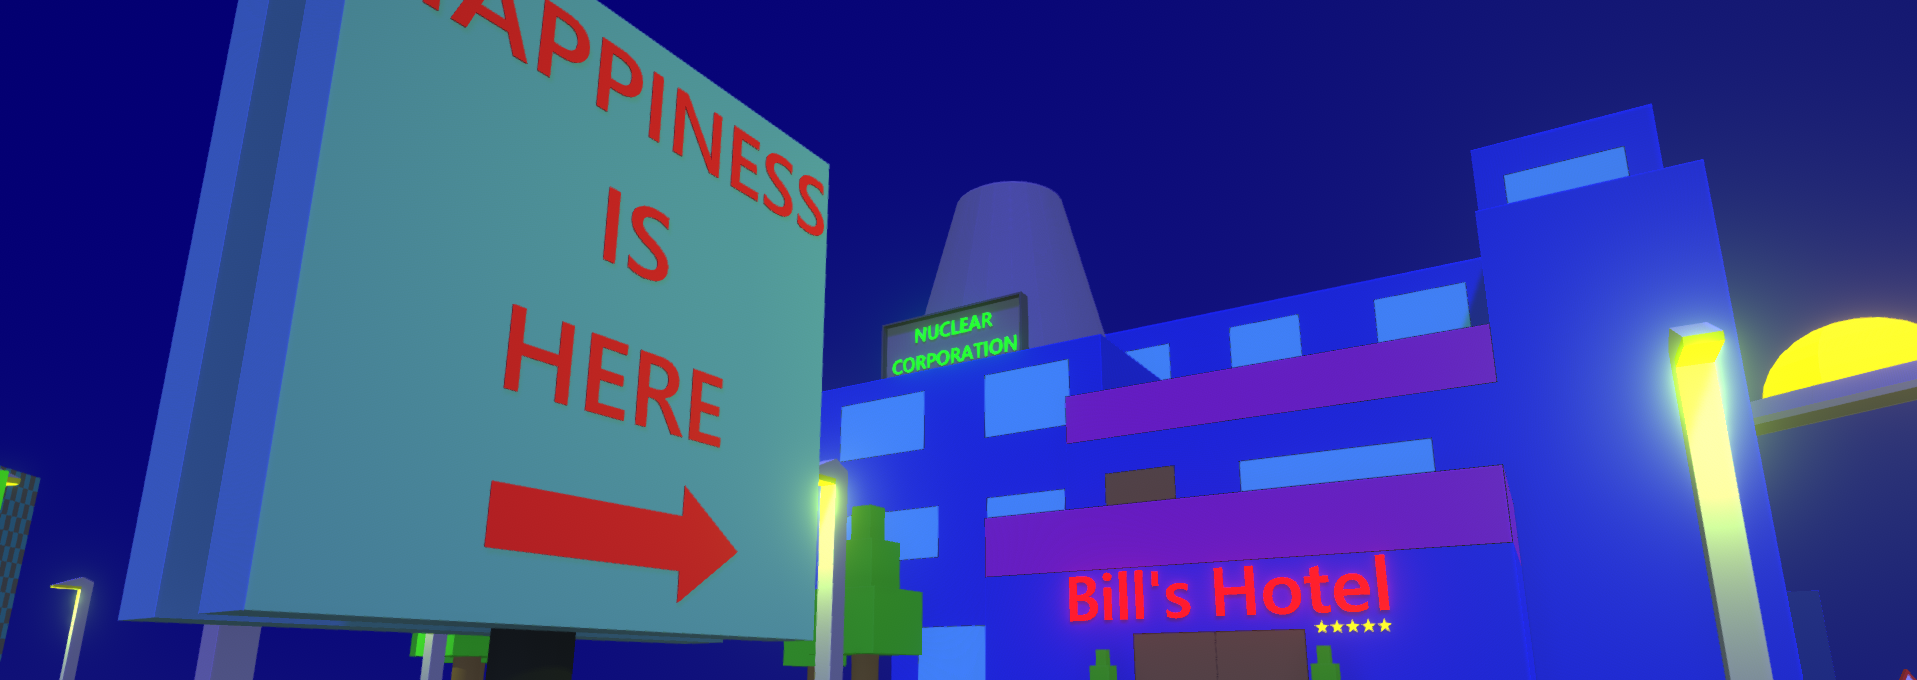 Bill's Hotel